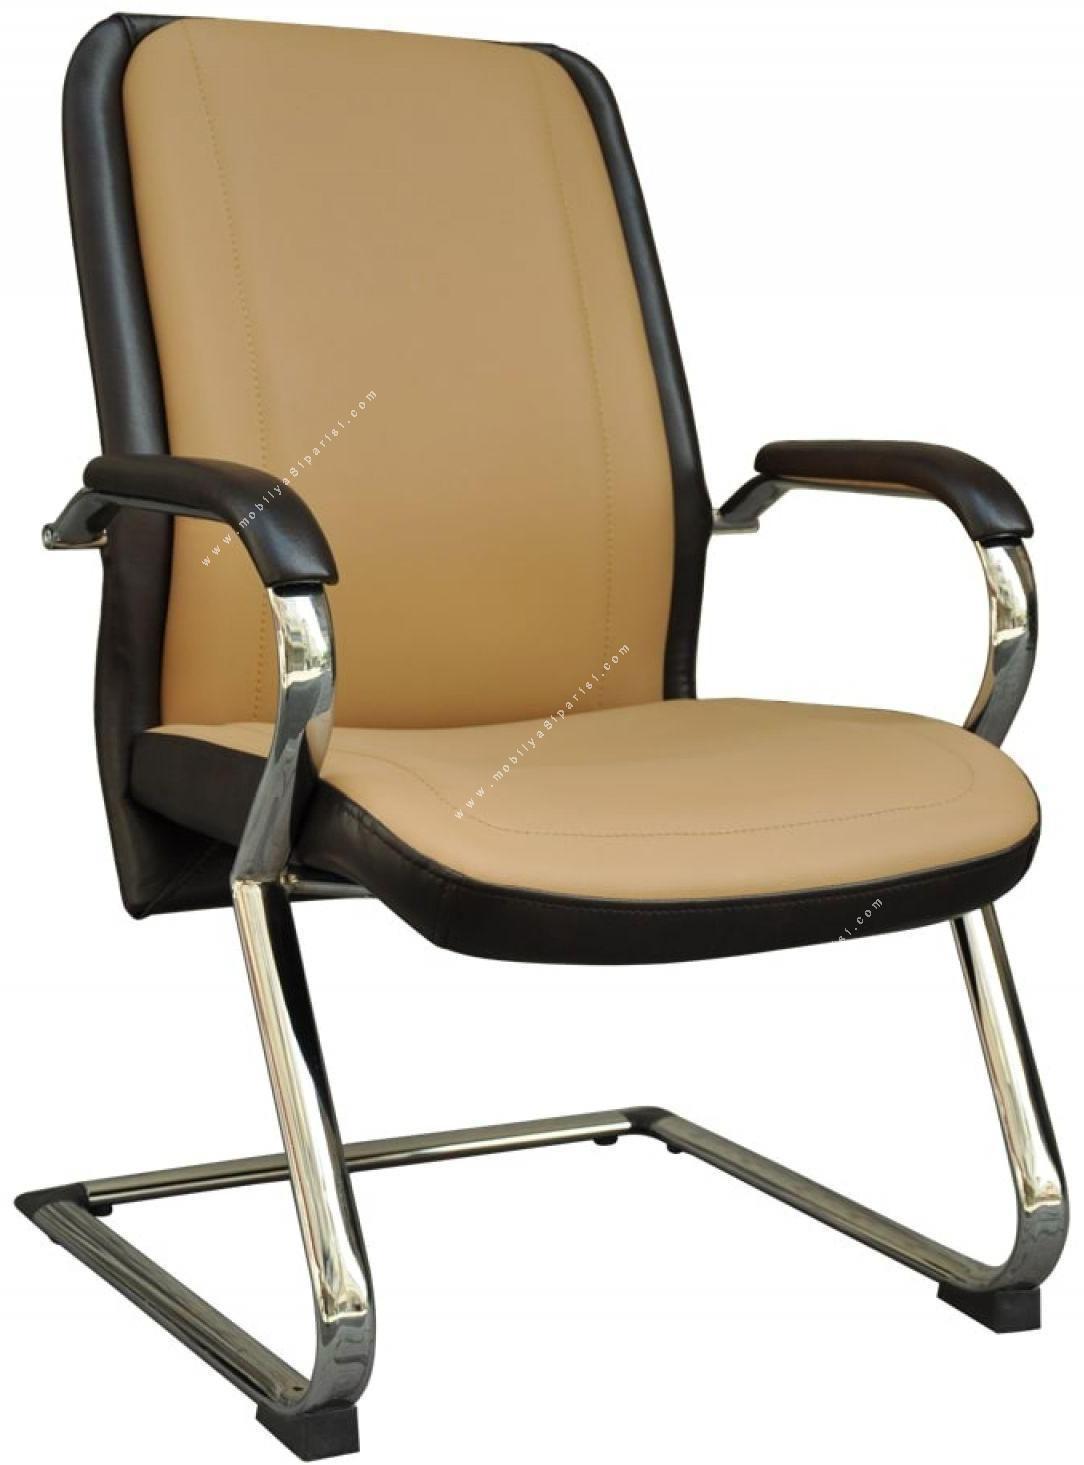 Çift Ped Ve Renkli Misafir Sandalyesi